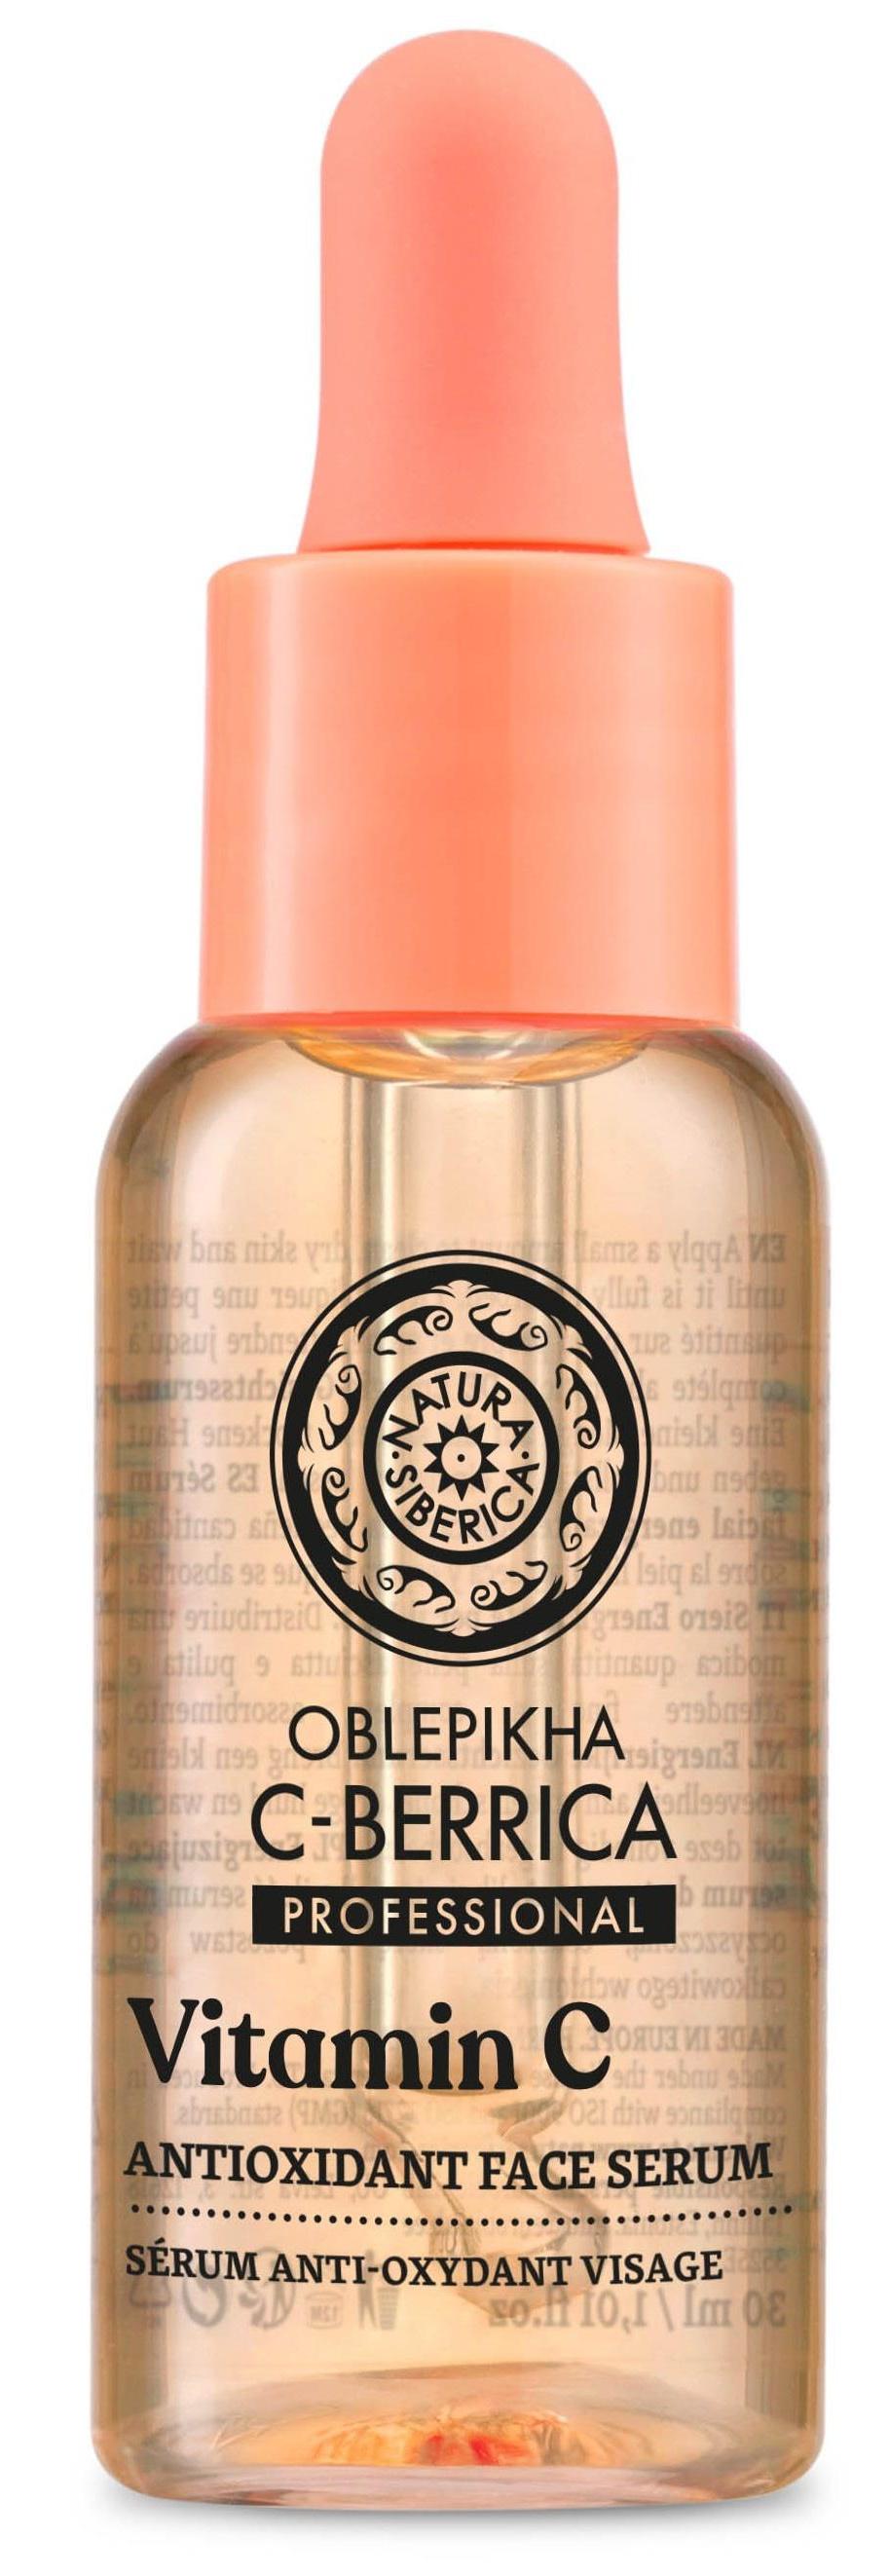 Natura Siberica C-Berrica, Antioxidant Face Serum (All Skin Types)